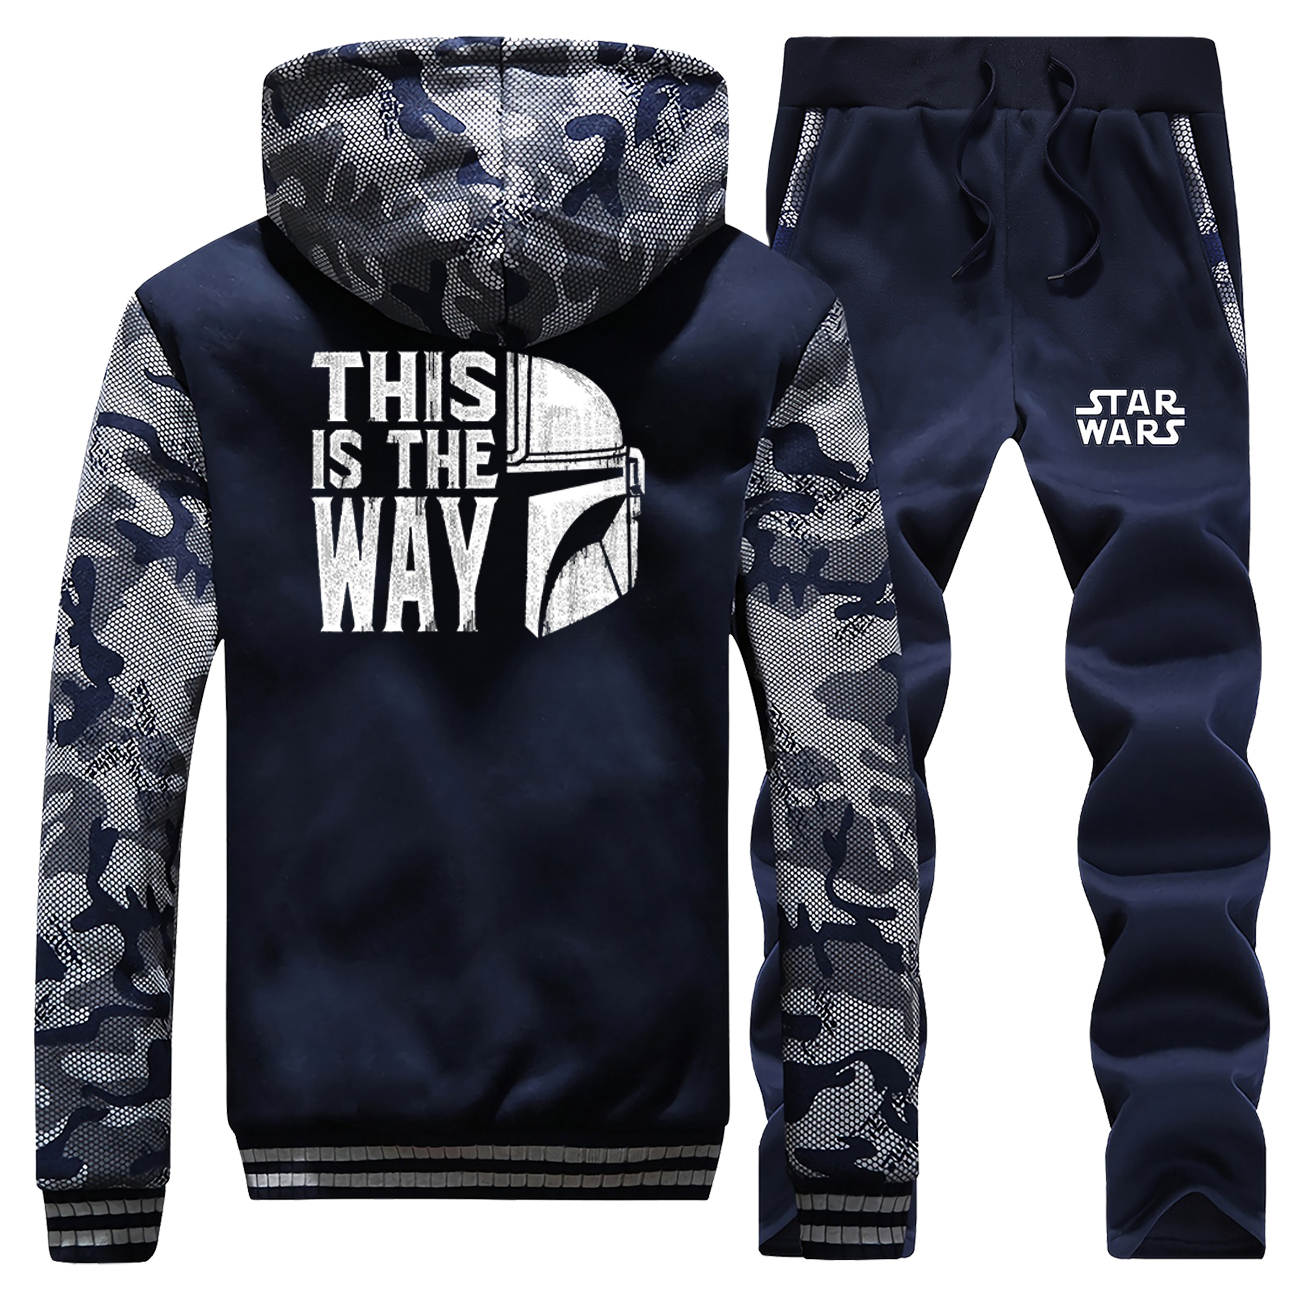 Men Winter Camo Jackets This Is The Way Baby Yoda Mandalorian Pans Sets Thick Fleece Jacket Cartoon Hoodies Sweatshirts Jackets